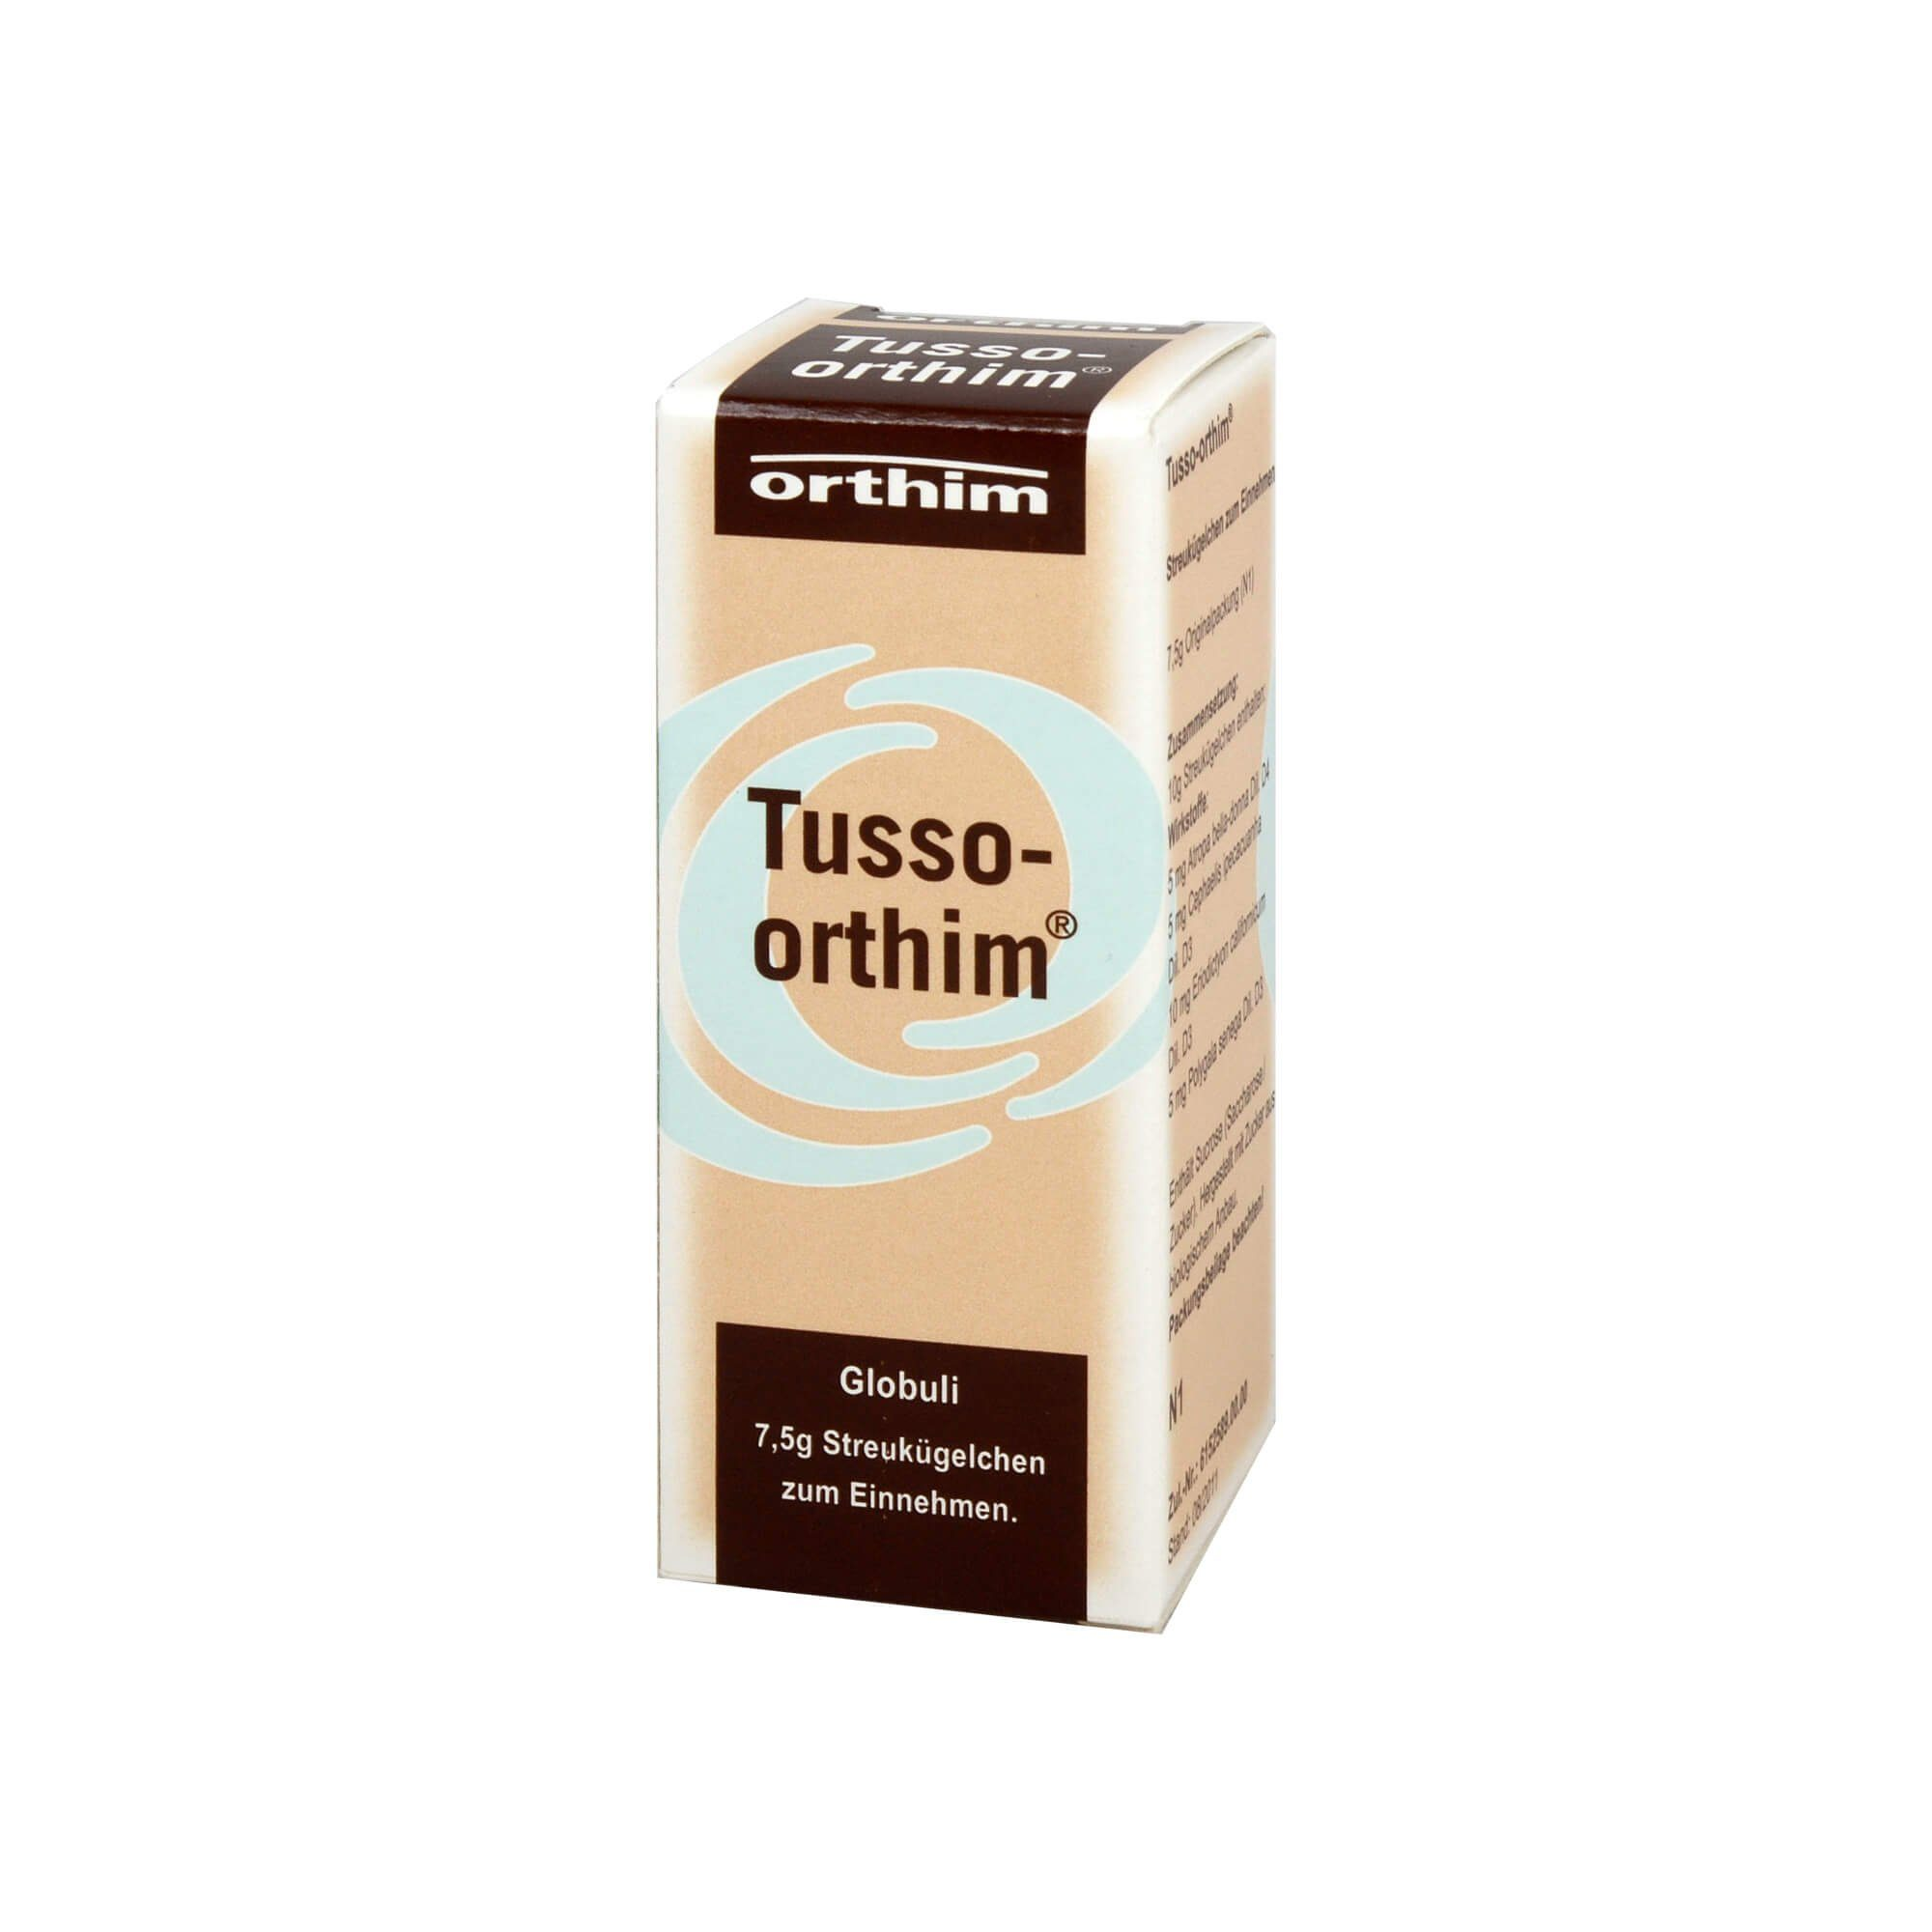 Tusso Orthim Globuli, 7.5 g